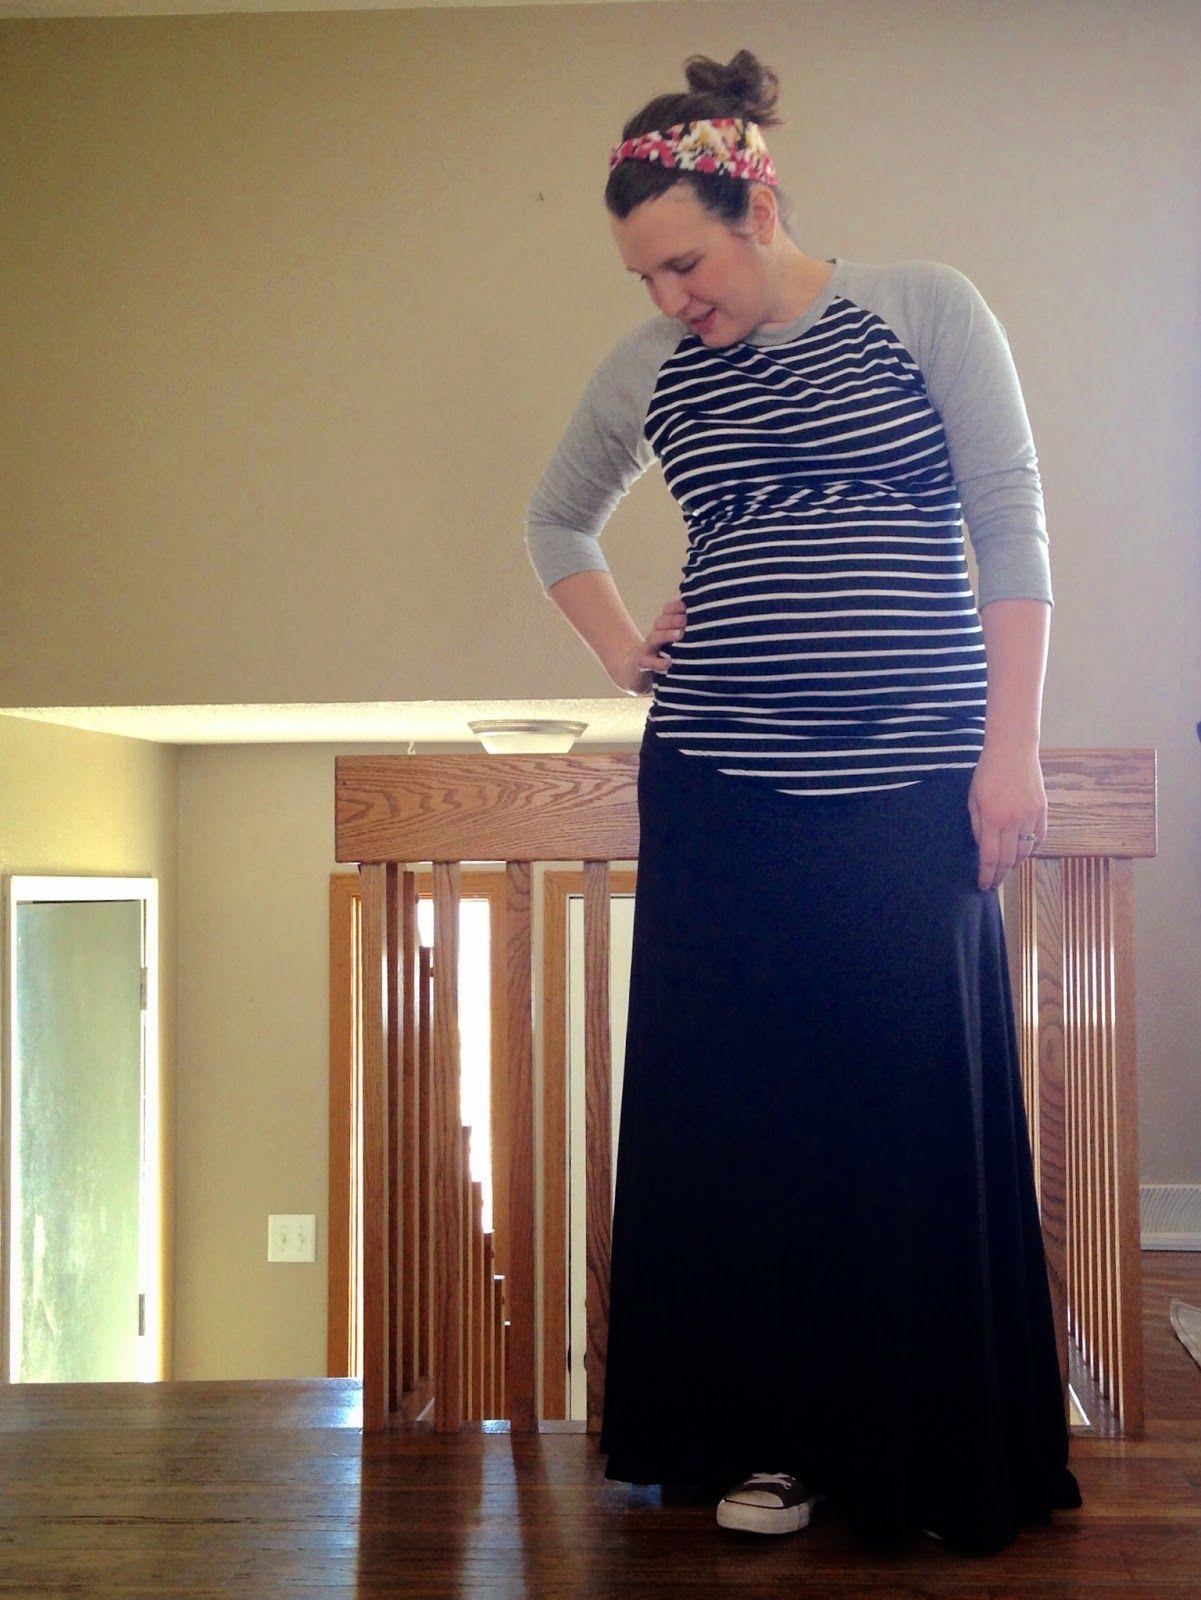 Lularoe randy tee maxi skirt and baby bump love it randy bybmg maternity style lularoe maxi skirt and randy tee ombrellifo Gallery